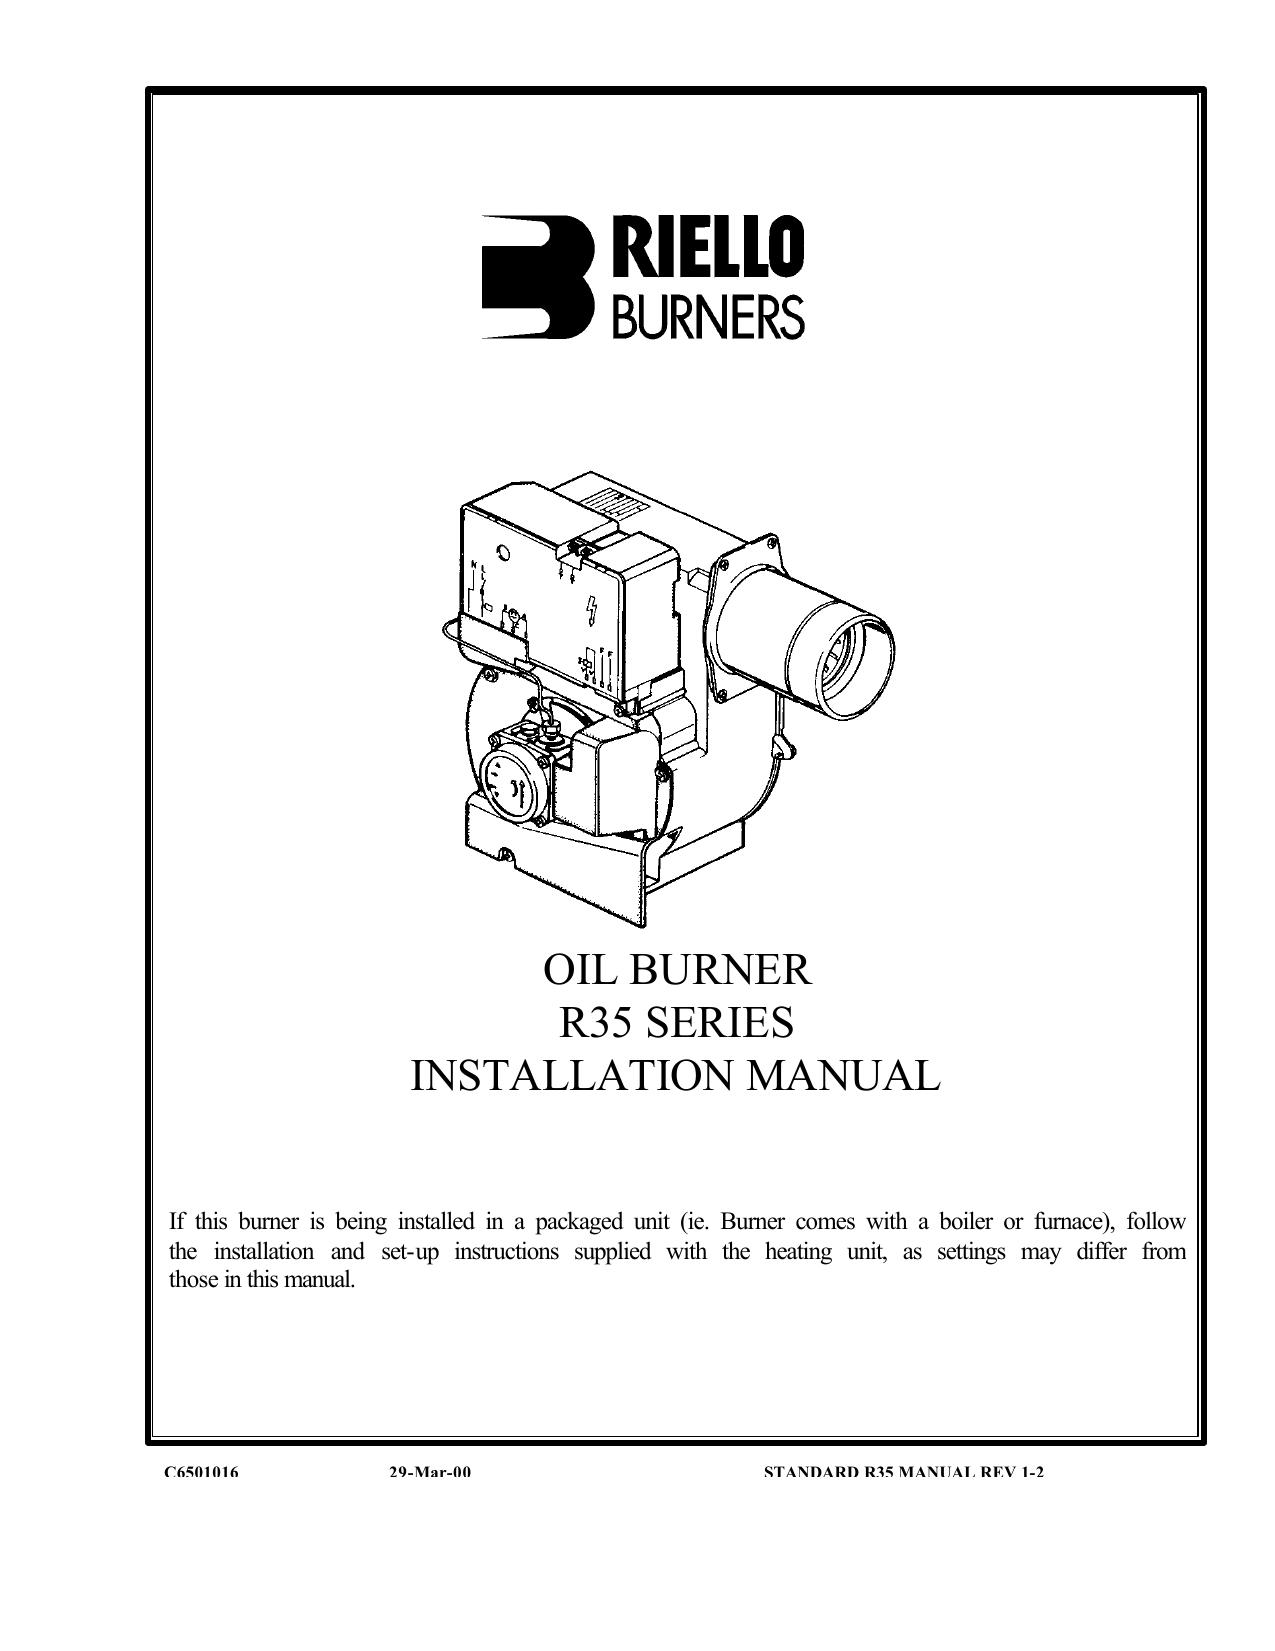 hight resolution of  beckett burner wiring oil burner r35 series installation manual manualzz com on power flame burner wiring diagram